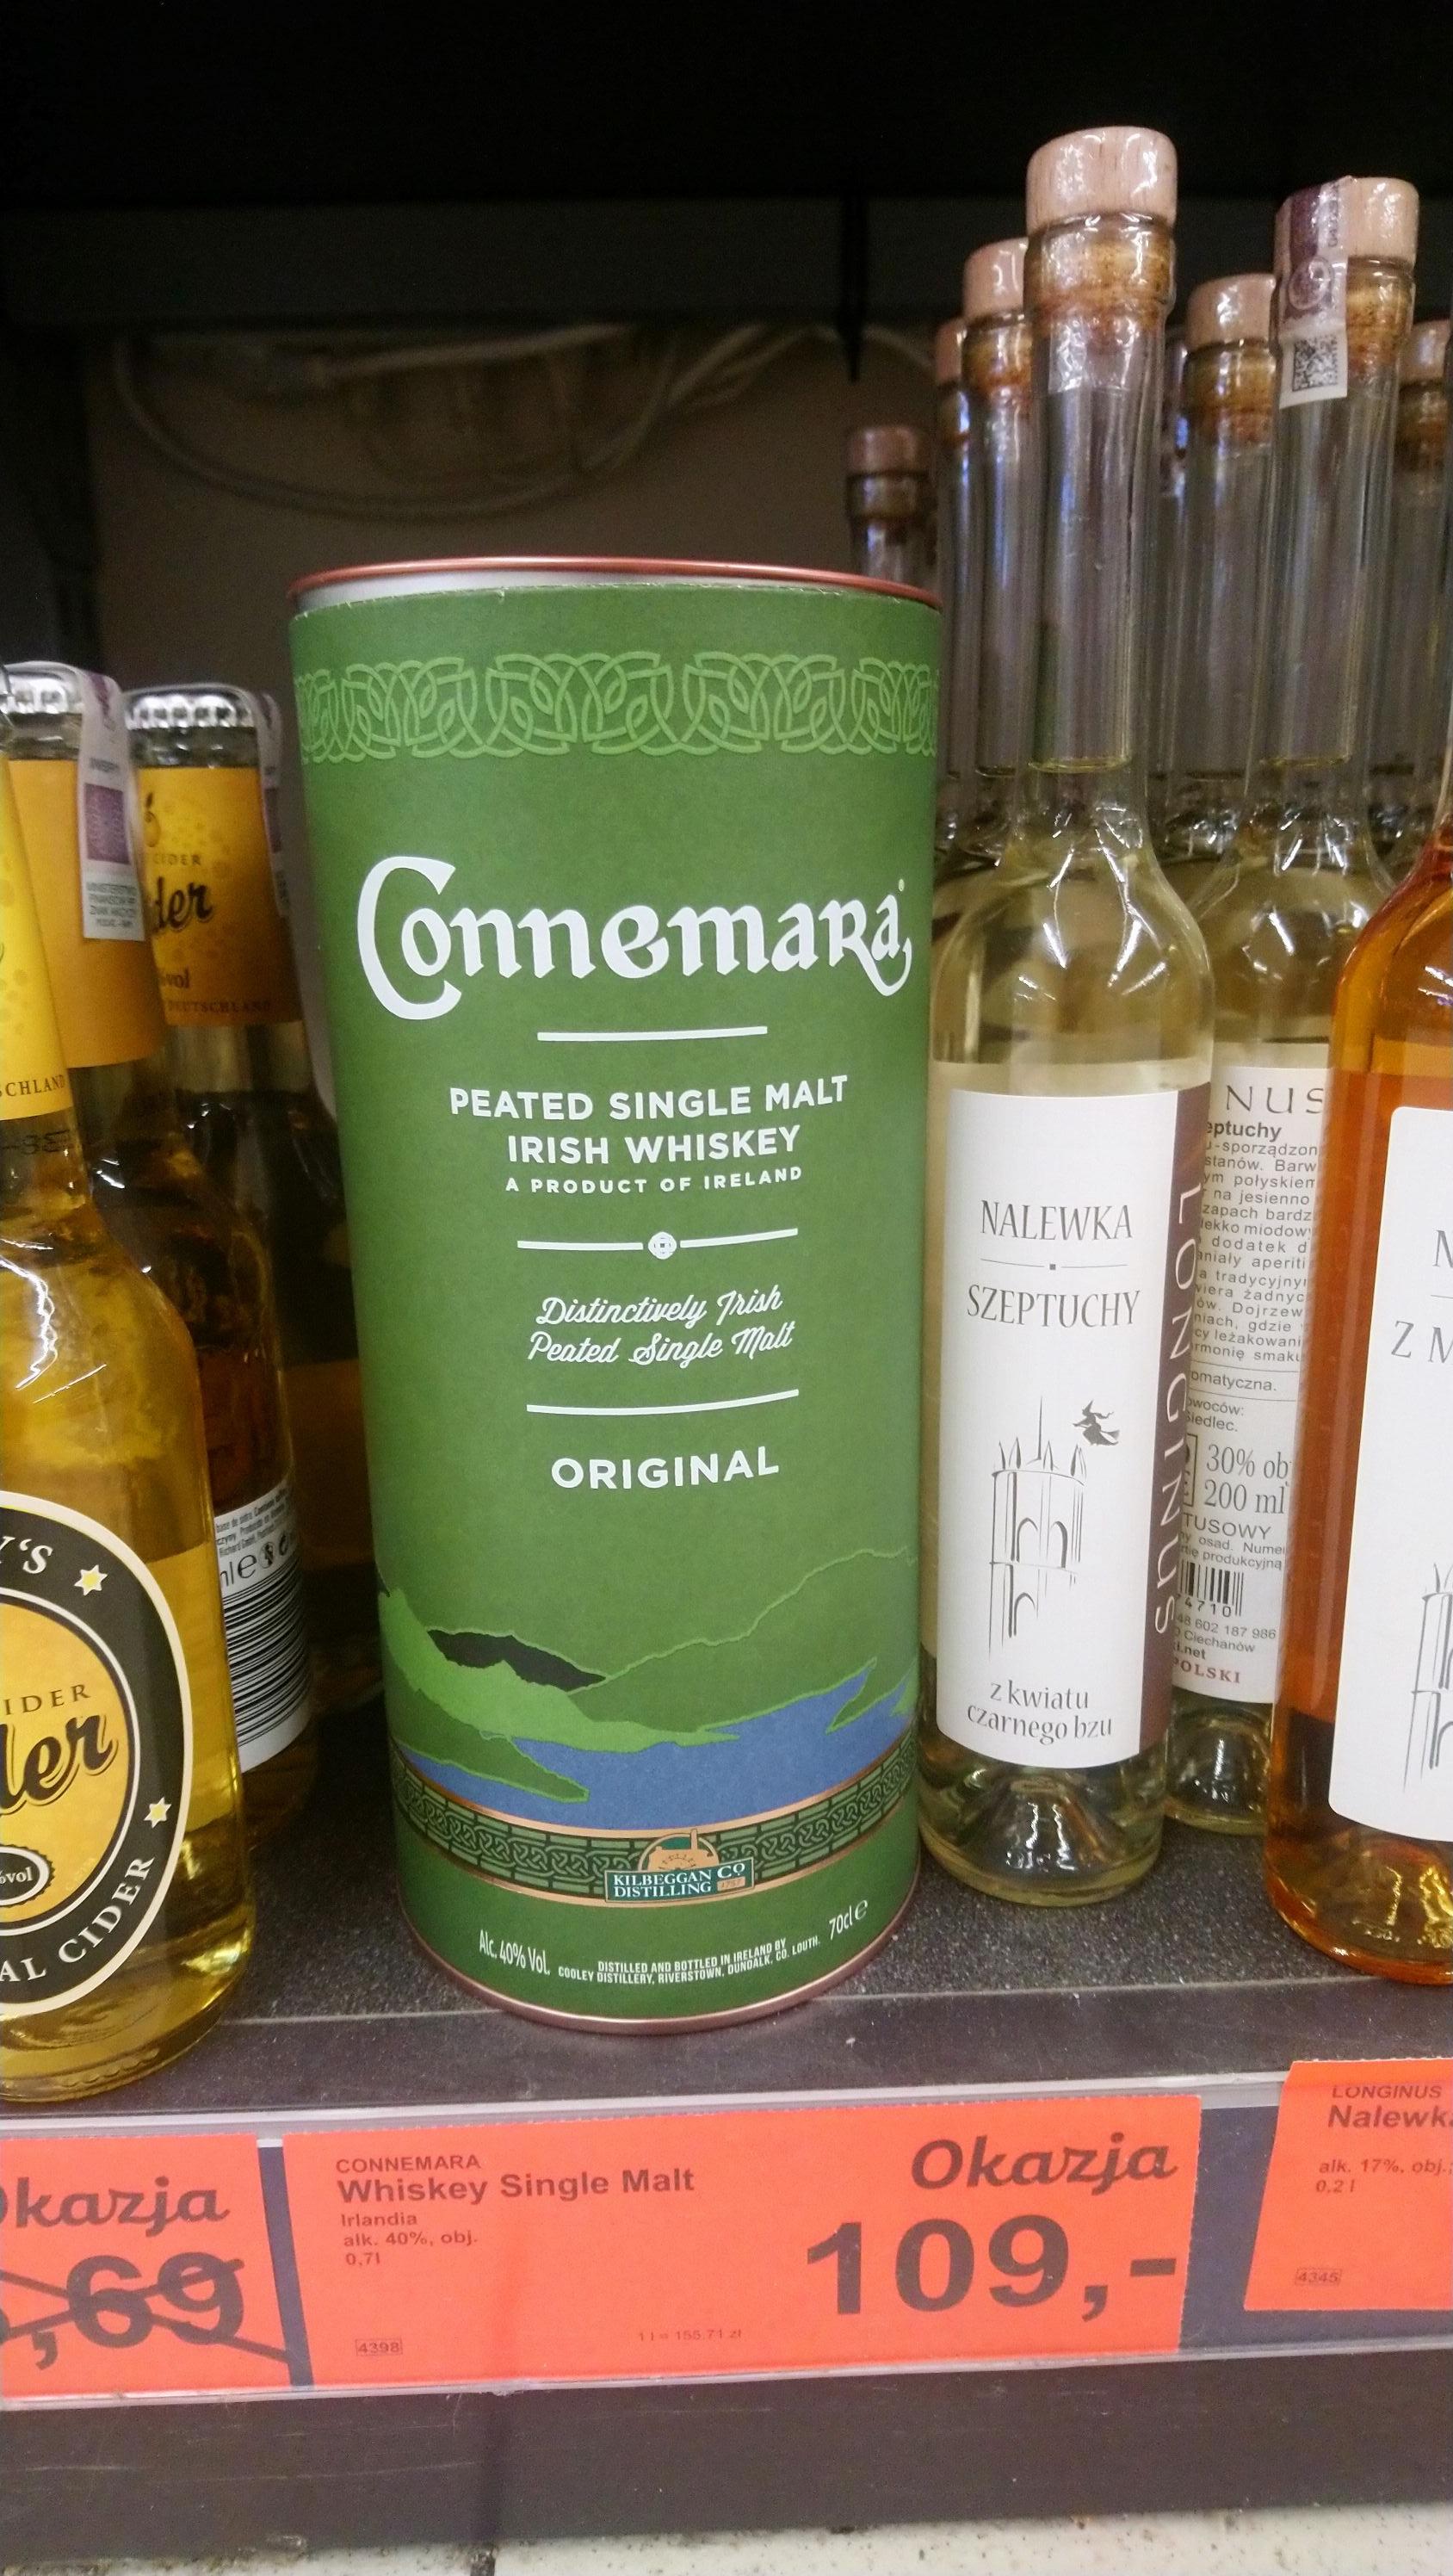 Connemara Irlandzka Whiskey single malt, piękna puszka 0,7l Aldi Toruń